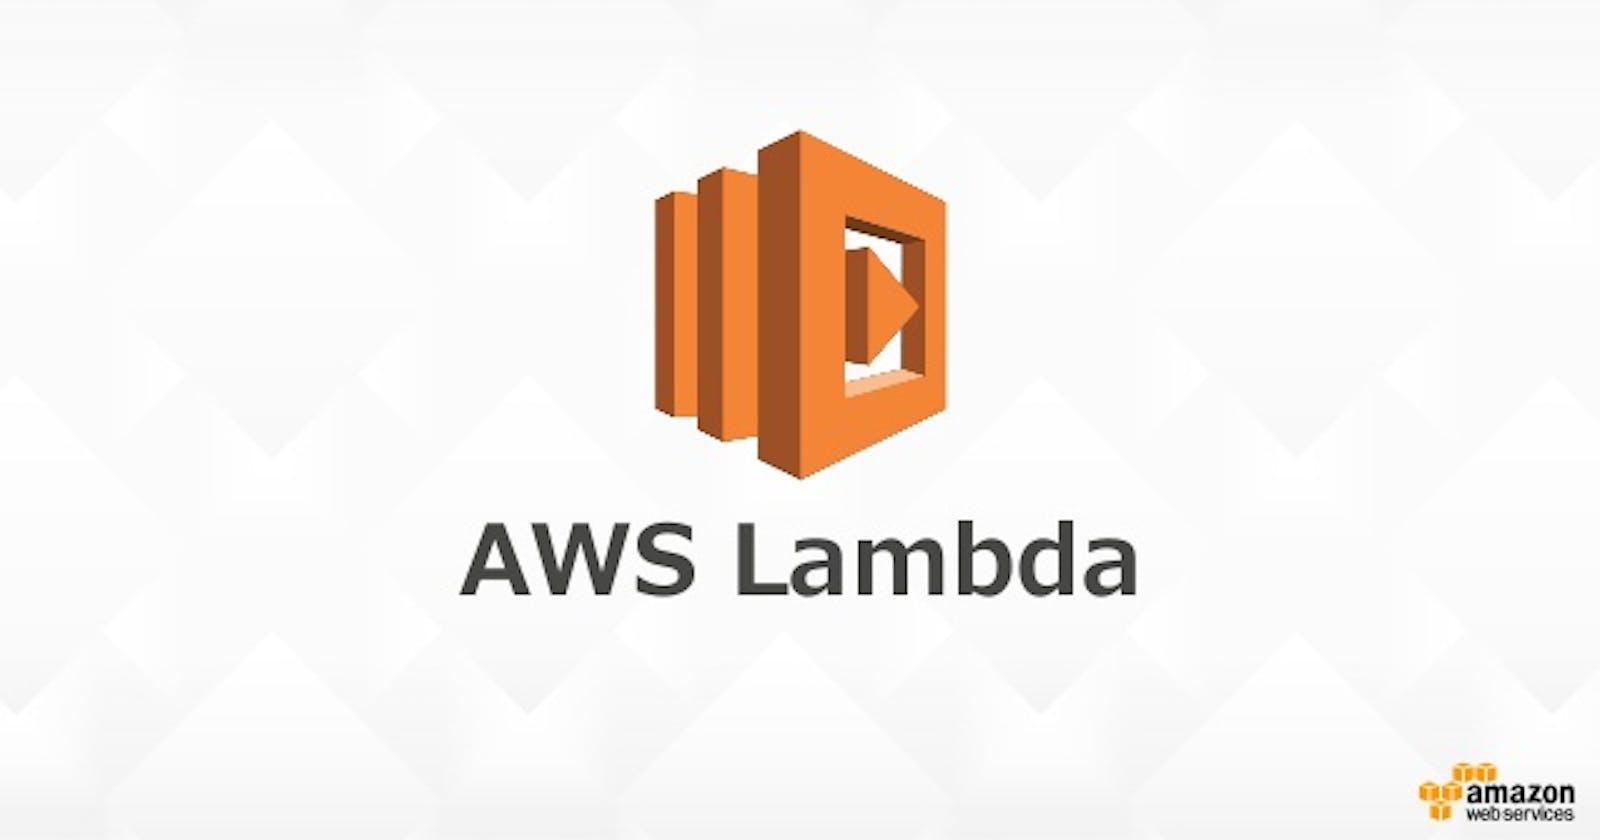 Getting to know AWS Lambda - FaaS